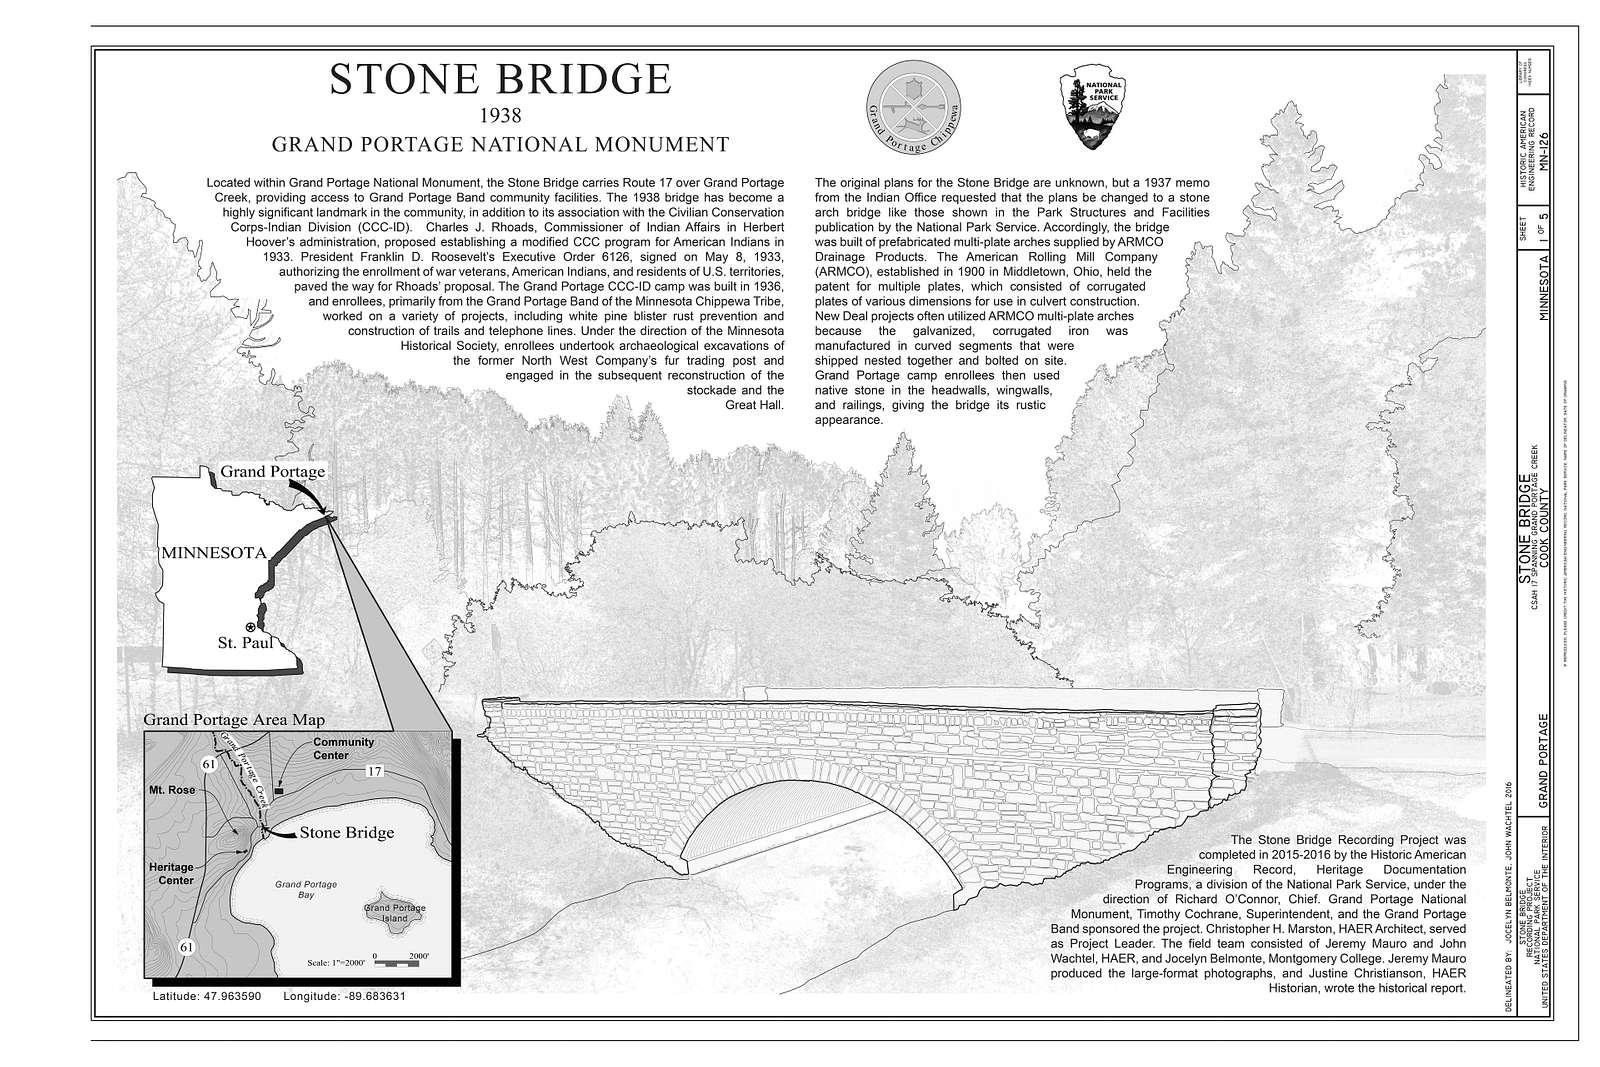 Stone Bridge, CSAH 17 spanning Grand Portage Creek, Grand Portage, Cook County, MN